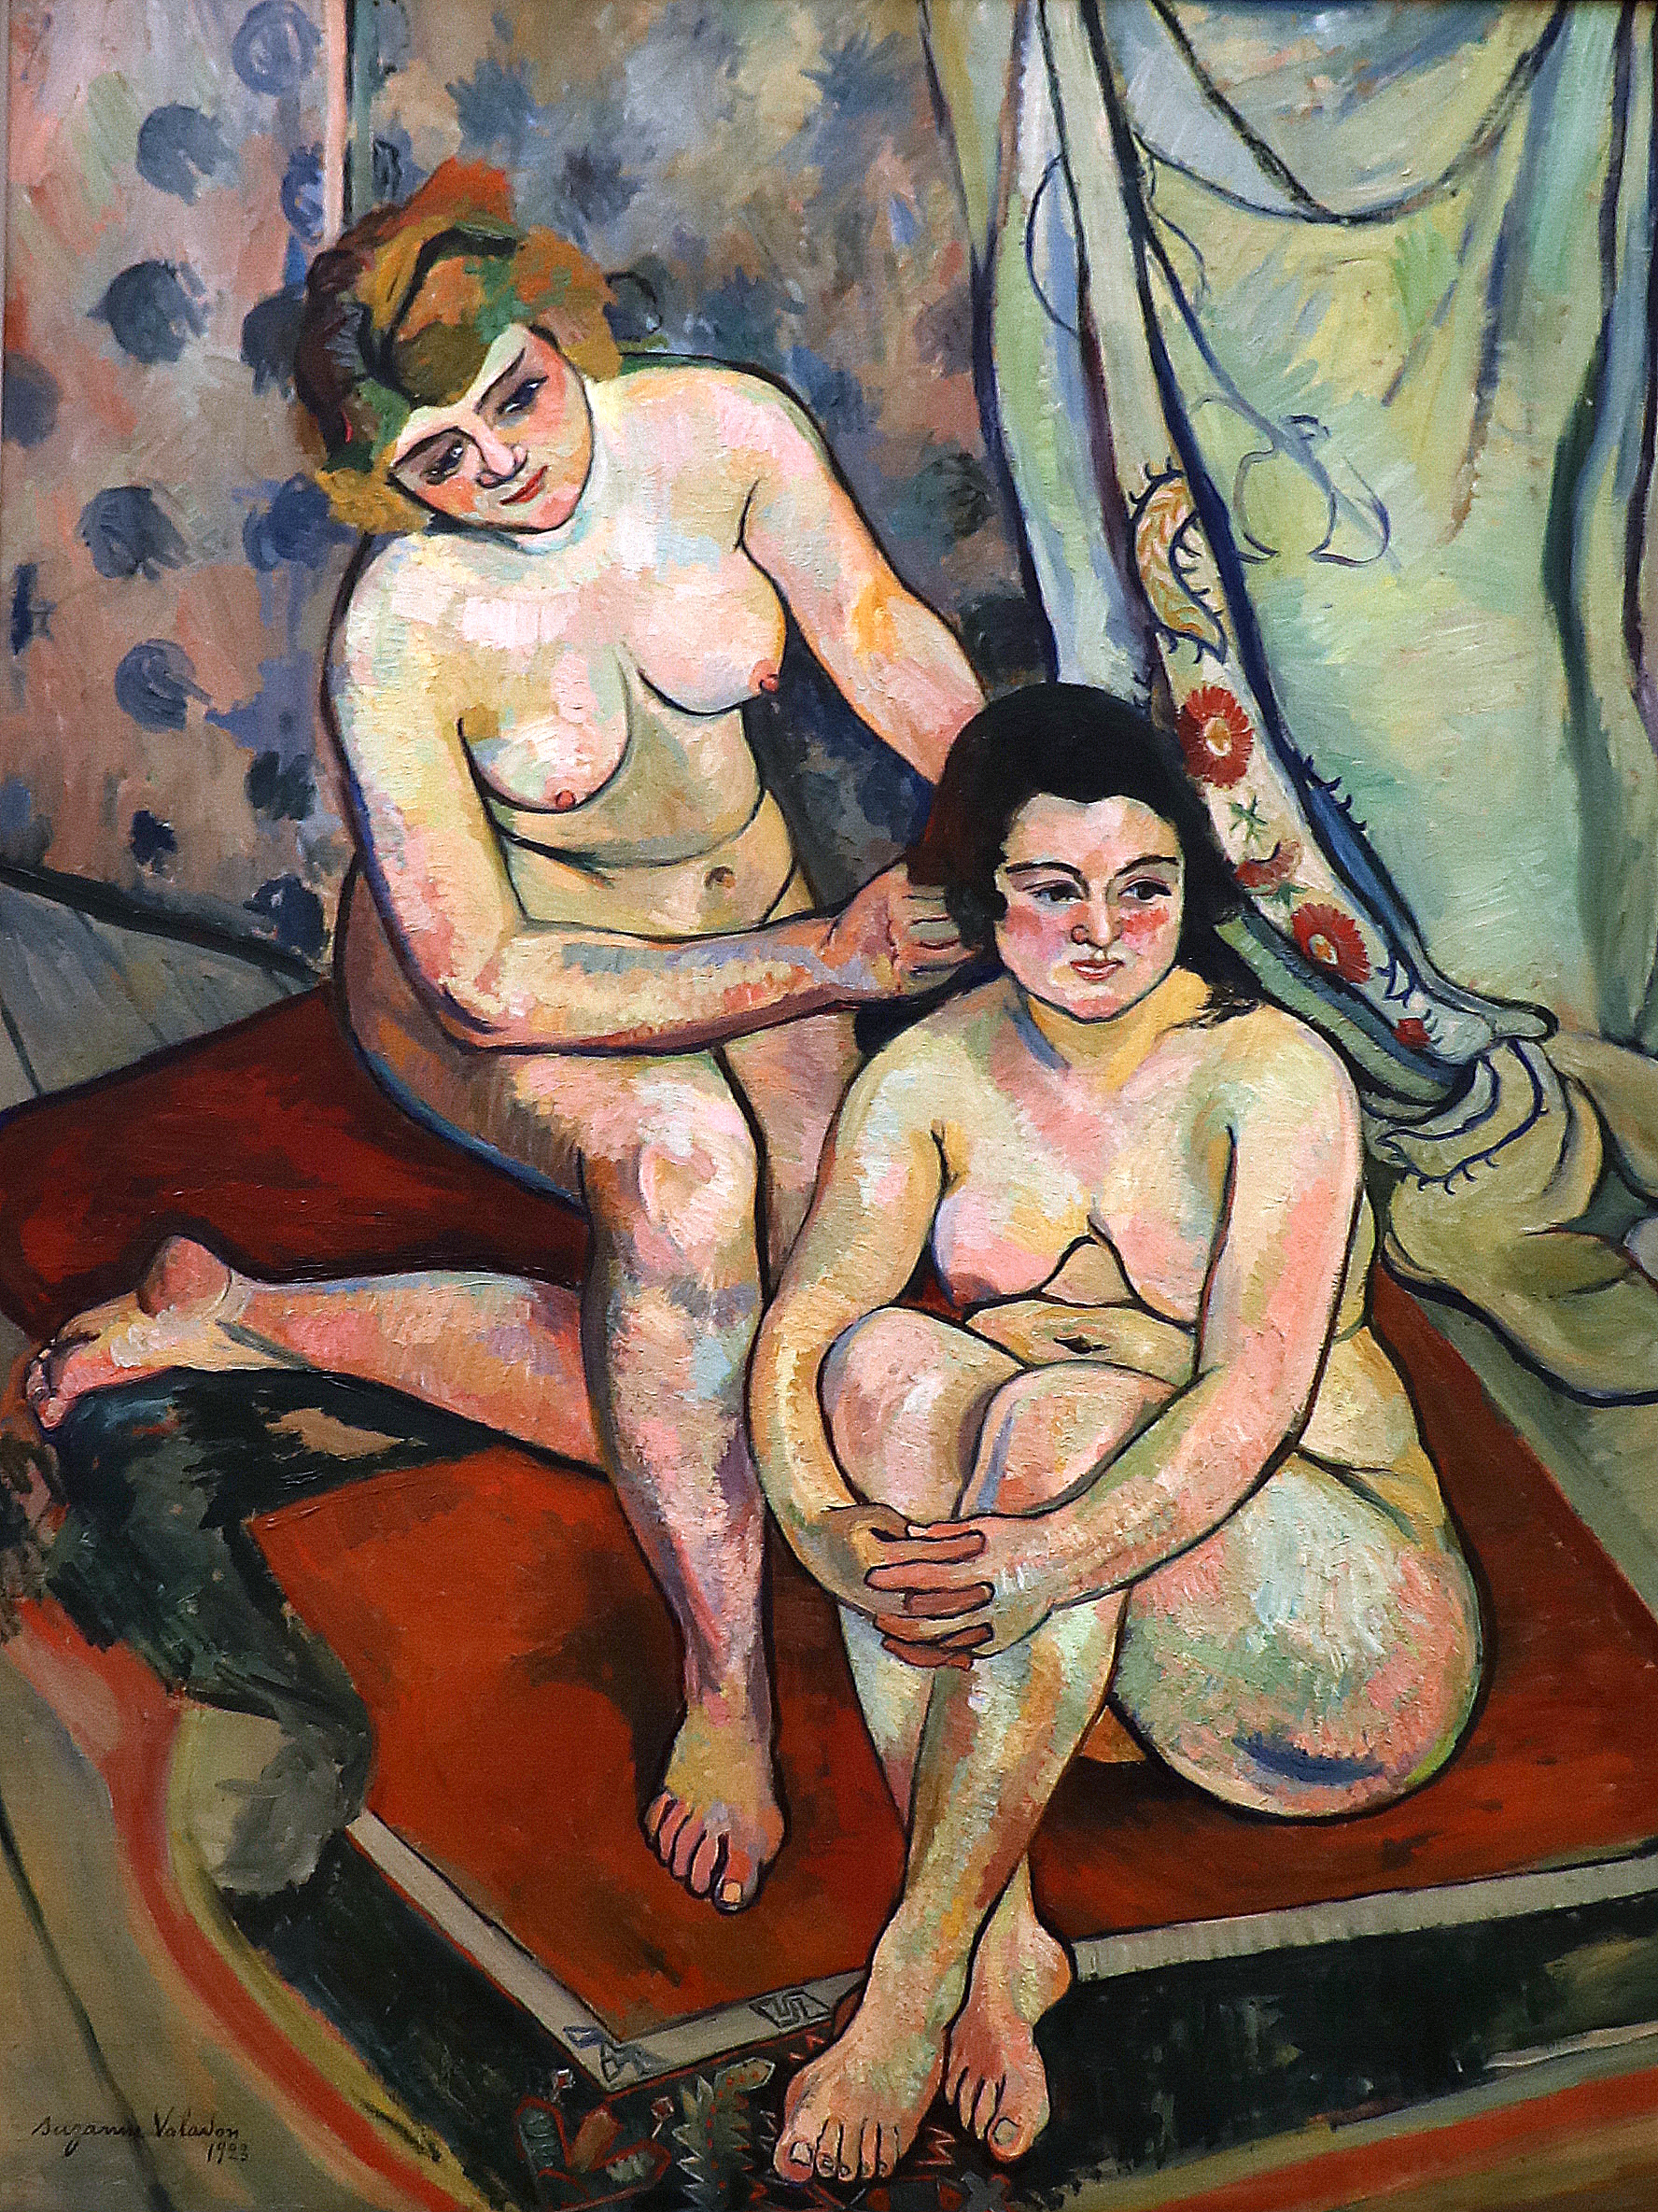 File:Les baigneuses (1923) de Suzanne Valadon.jpg - Wikimedia Commons